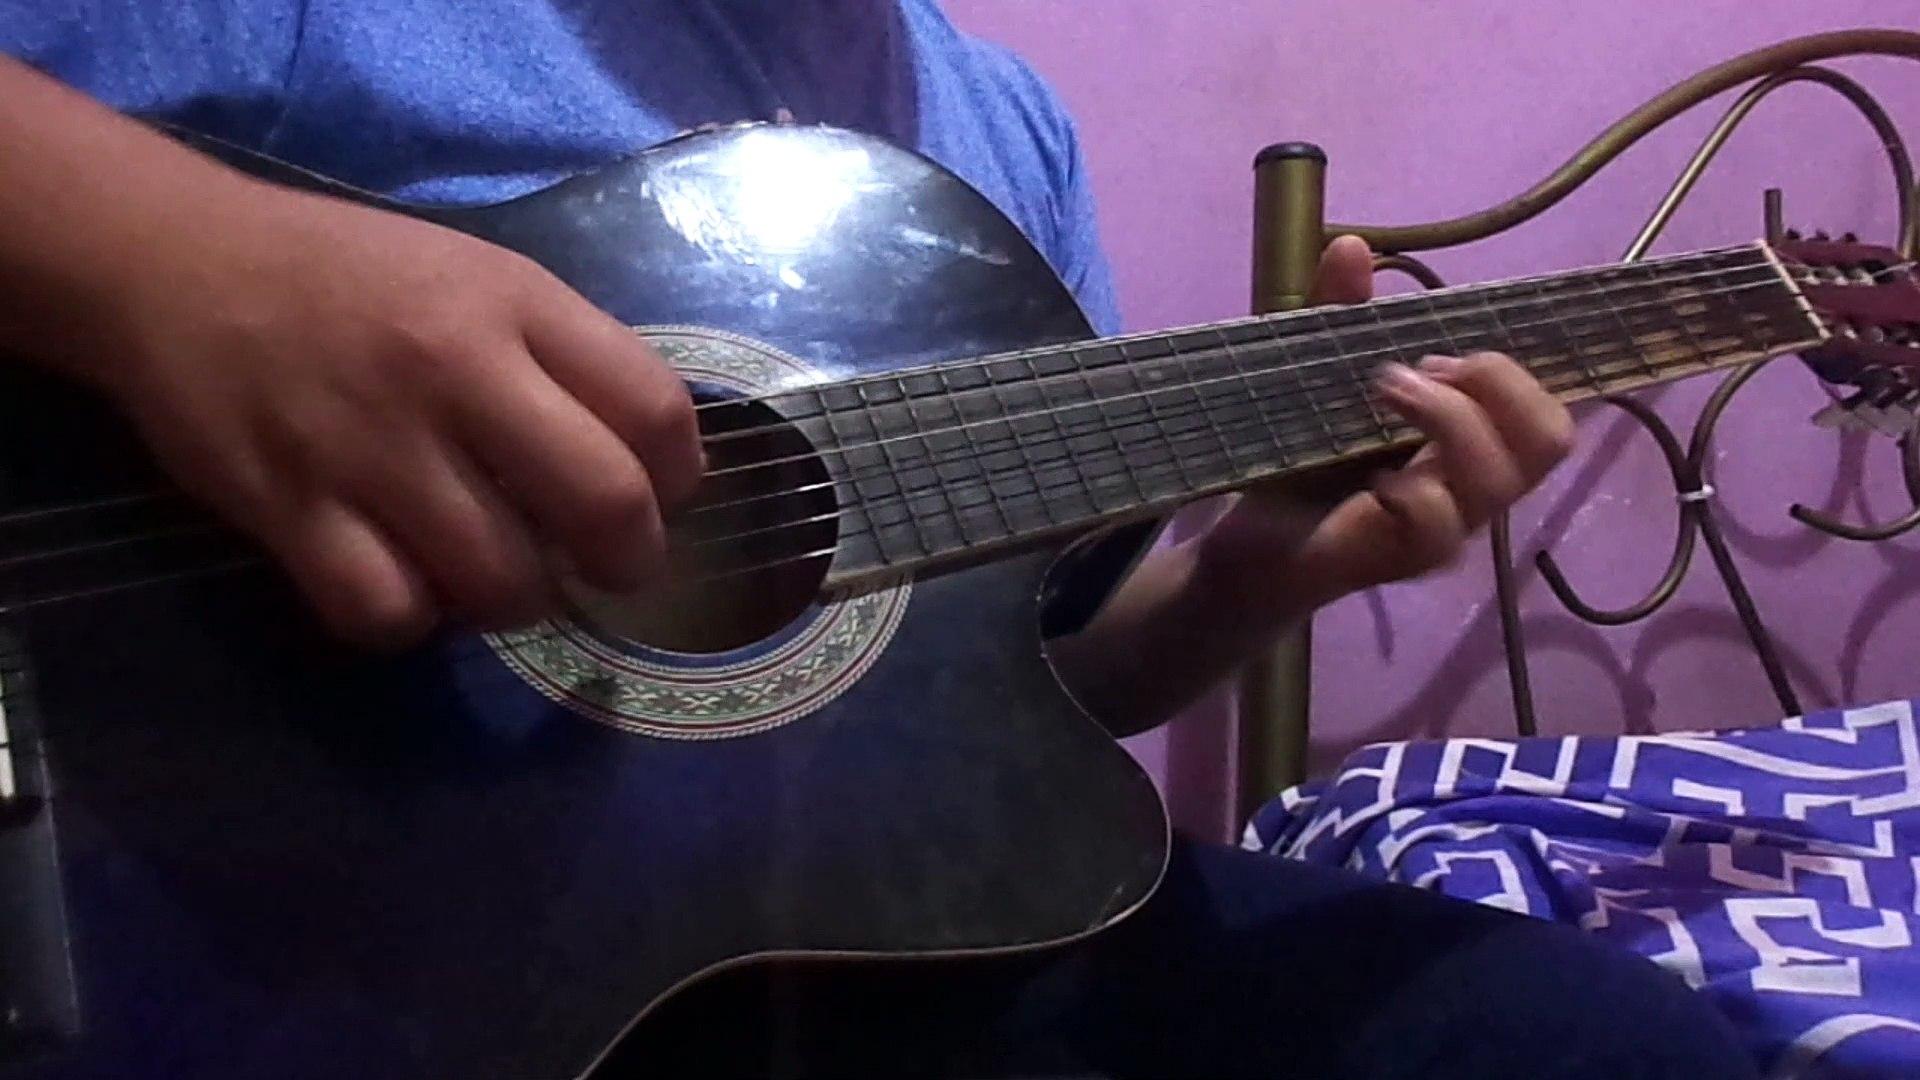 X [Equis] (Nicky Jam X J. Balvin) - Guitarra Clasica Fingerstyle - Tab